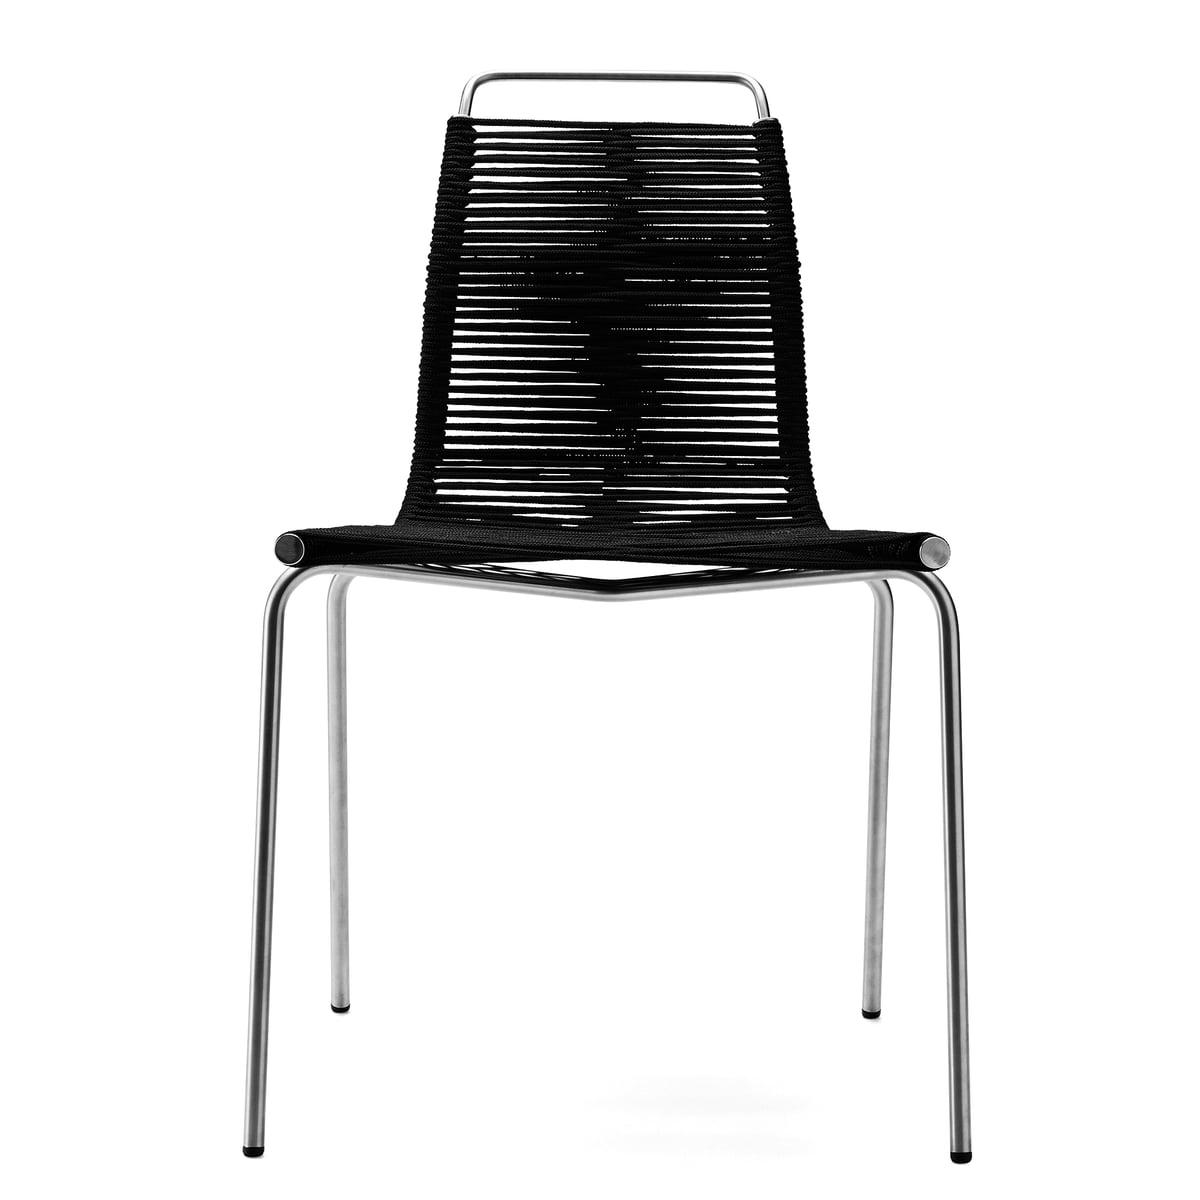 pk1 stuhl indoor von carl hansen connox. Black Bedroom Furniture Sets. Home Design Ideas